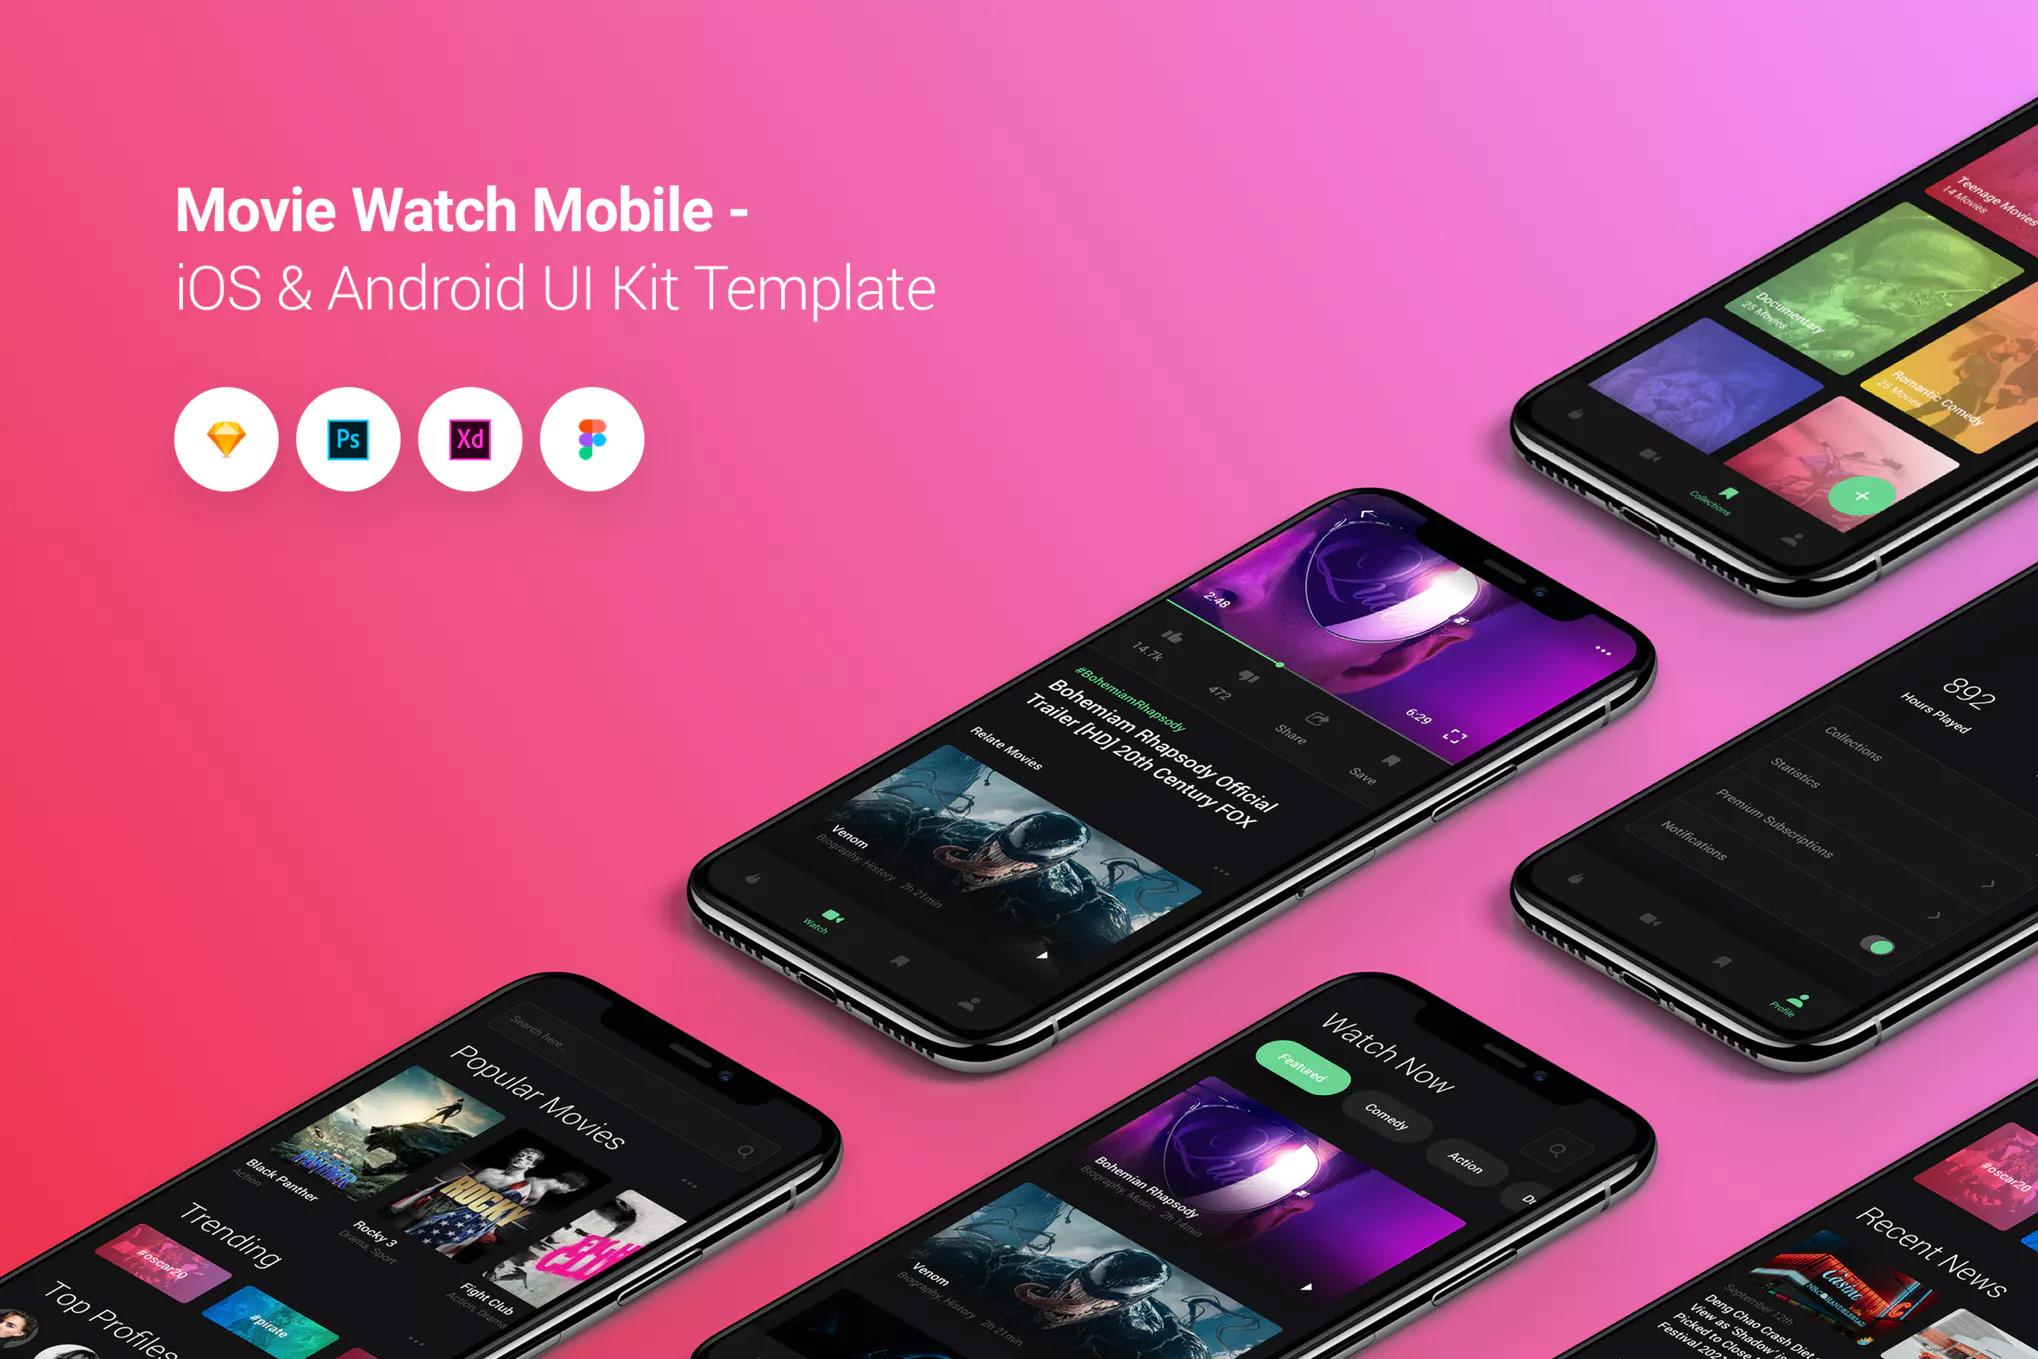 精美IOS风格时尚电影应用APP移动iOS和Android UI工具包模板  Movie Watch Mobile iOS & Android UI Kit Template by PanoplyStore